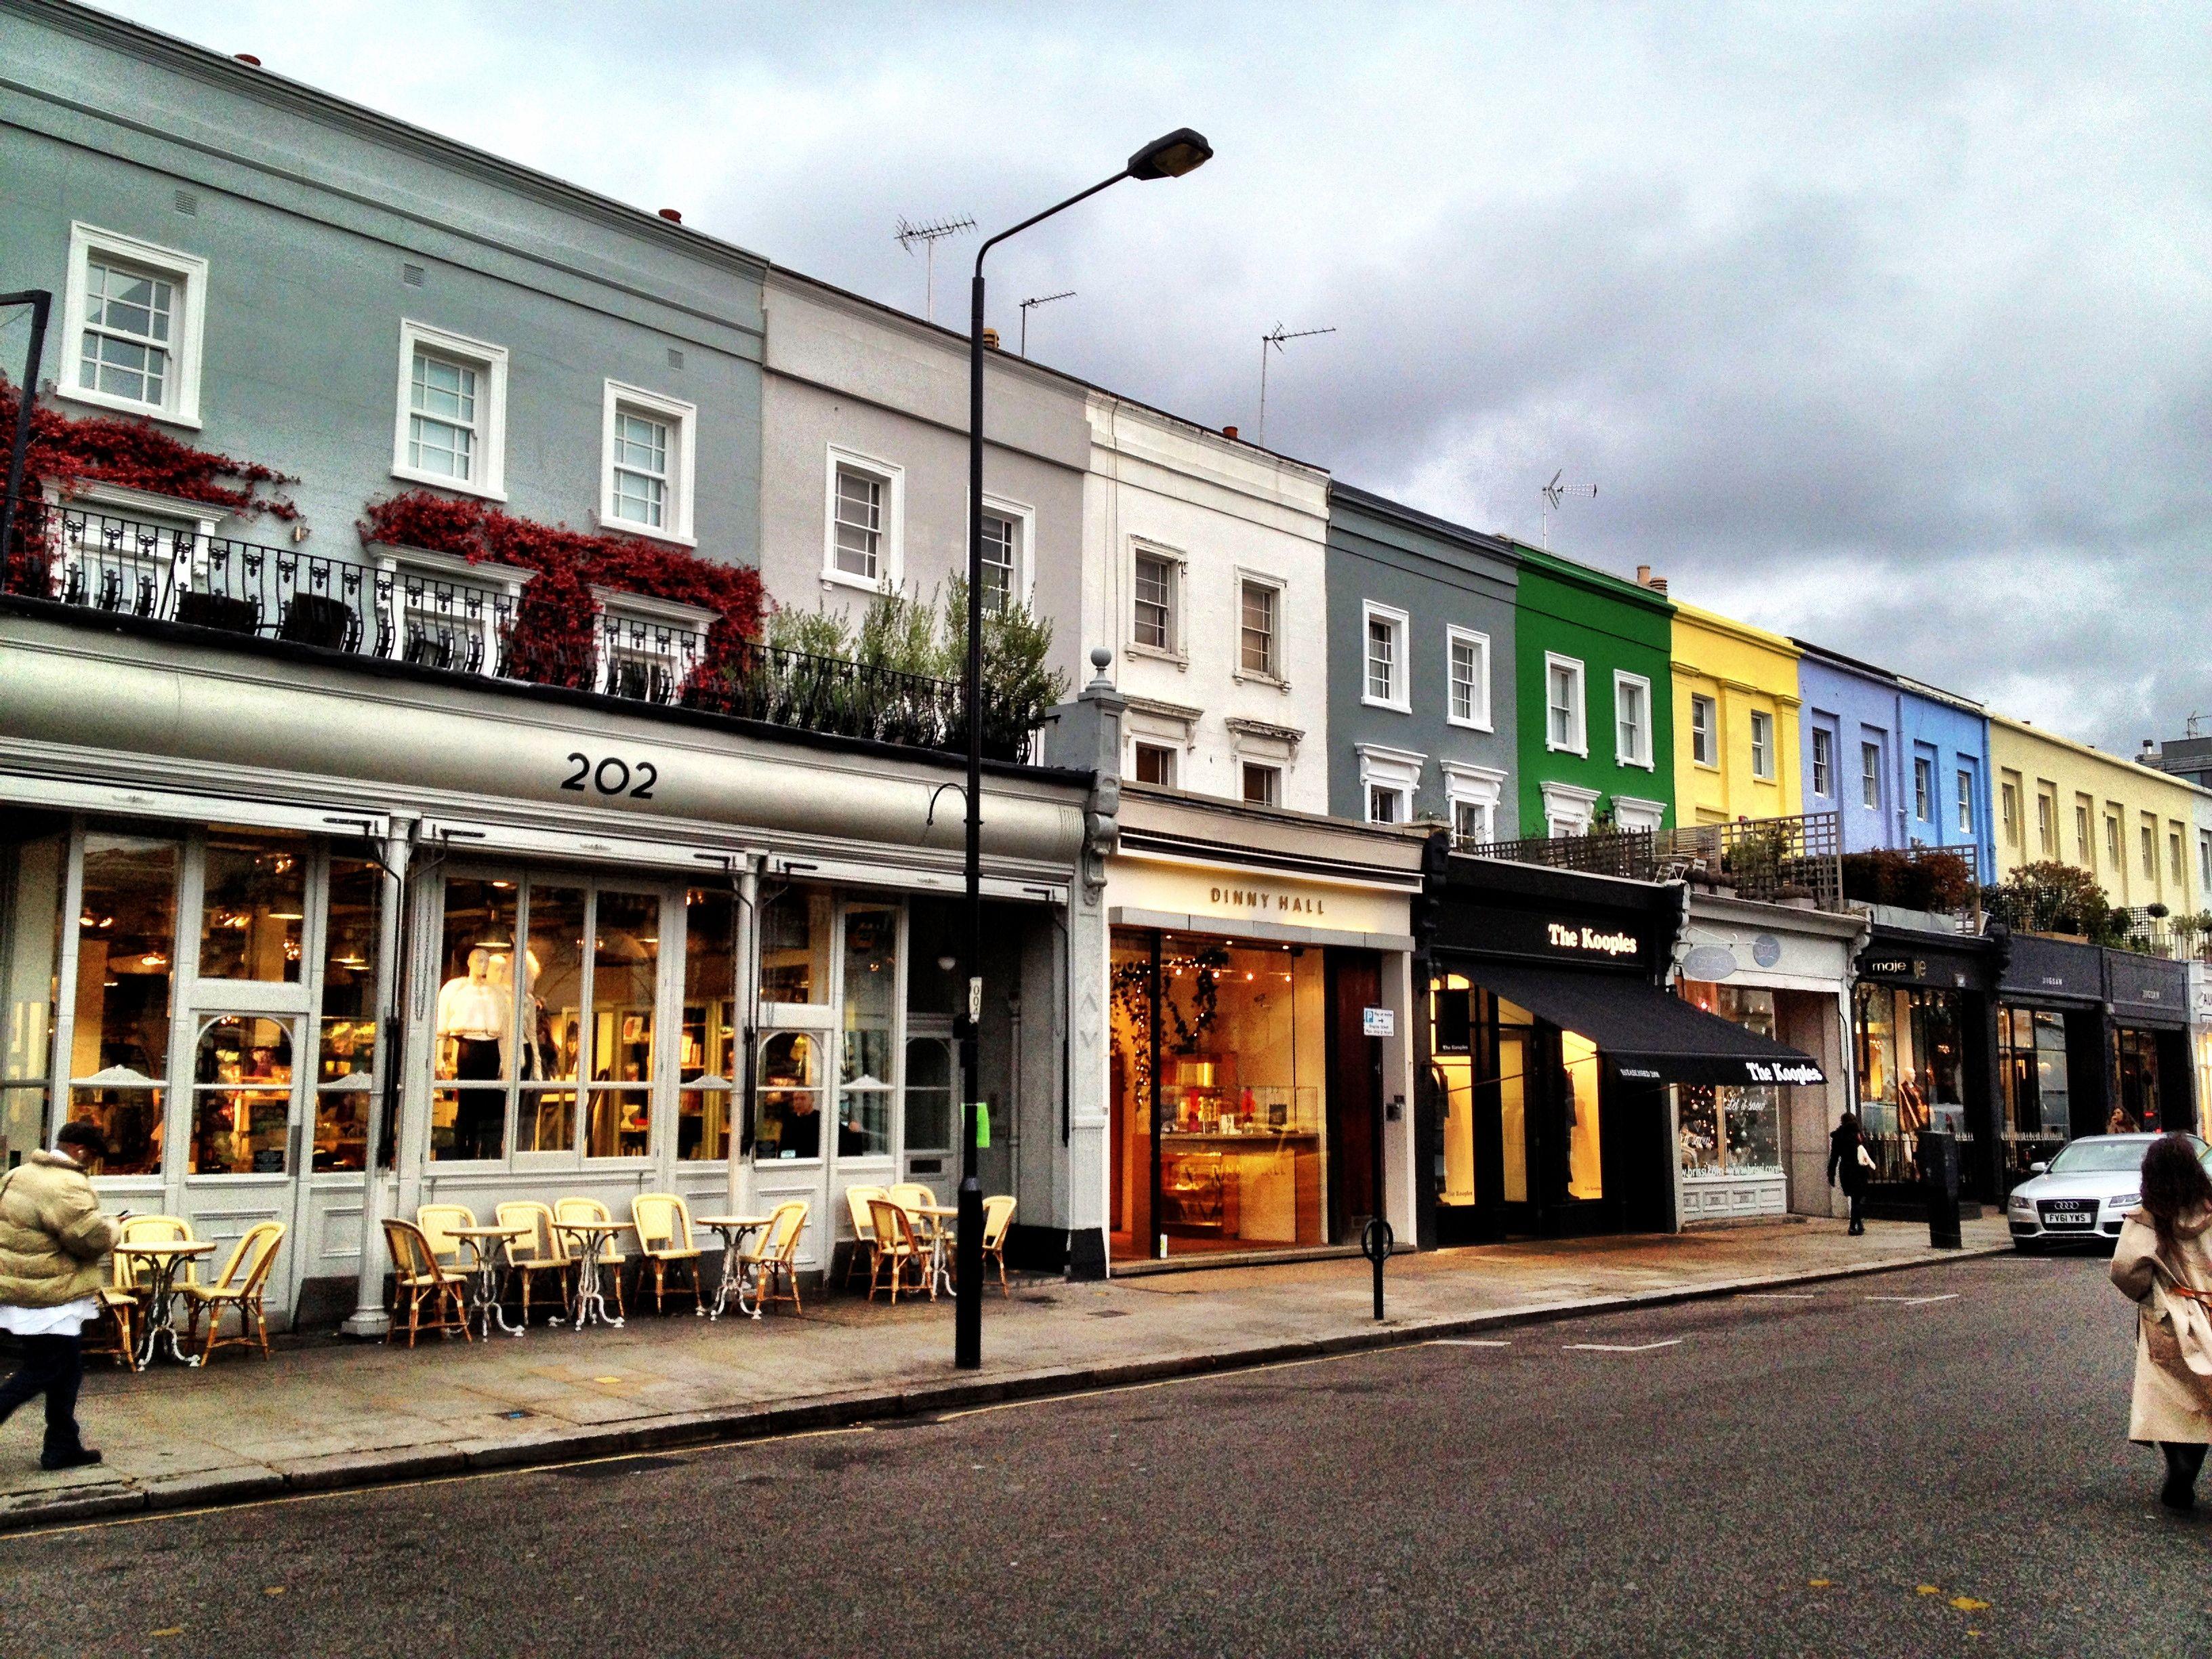 cafe 202 notting hill london pinterest notting hill london life and ireland. Black Bedroom Furniture Sets. Home Design Ideas